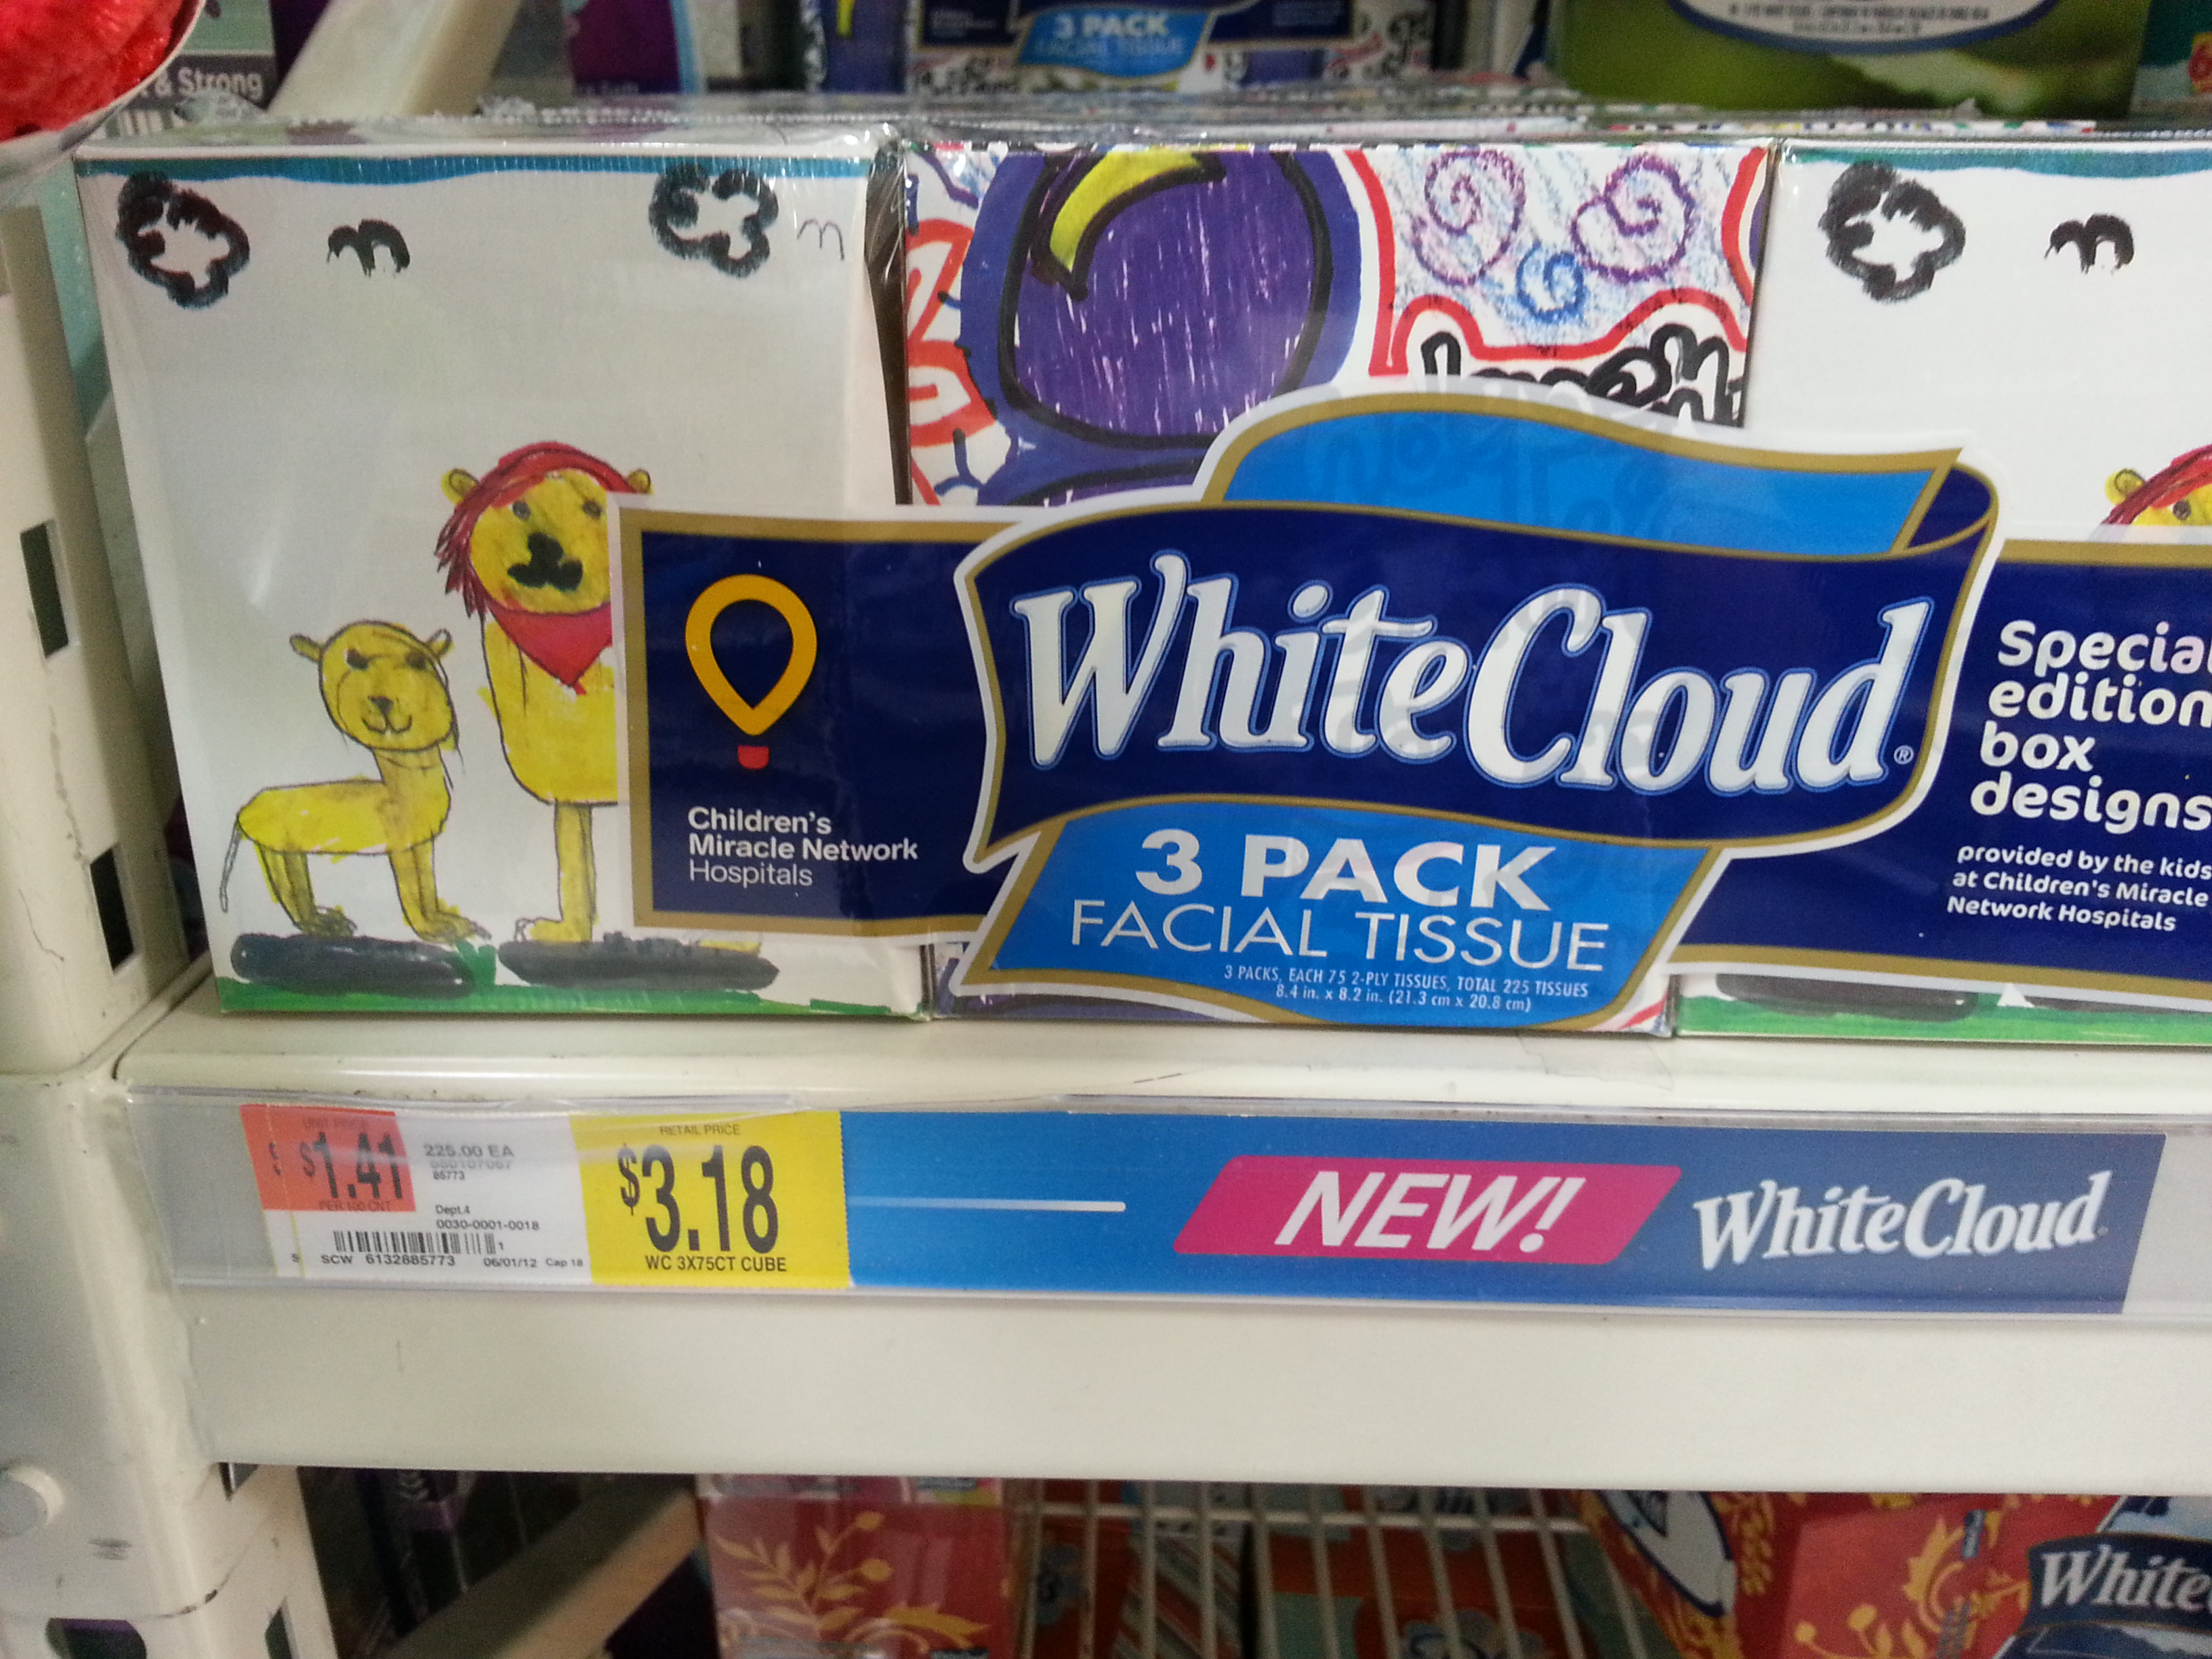 Designer deals club for hancock - Freebies2deals Whitecloud